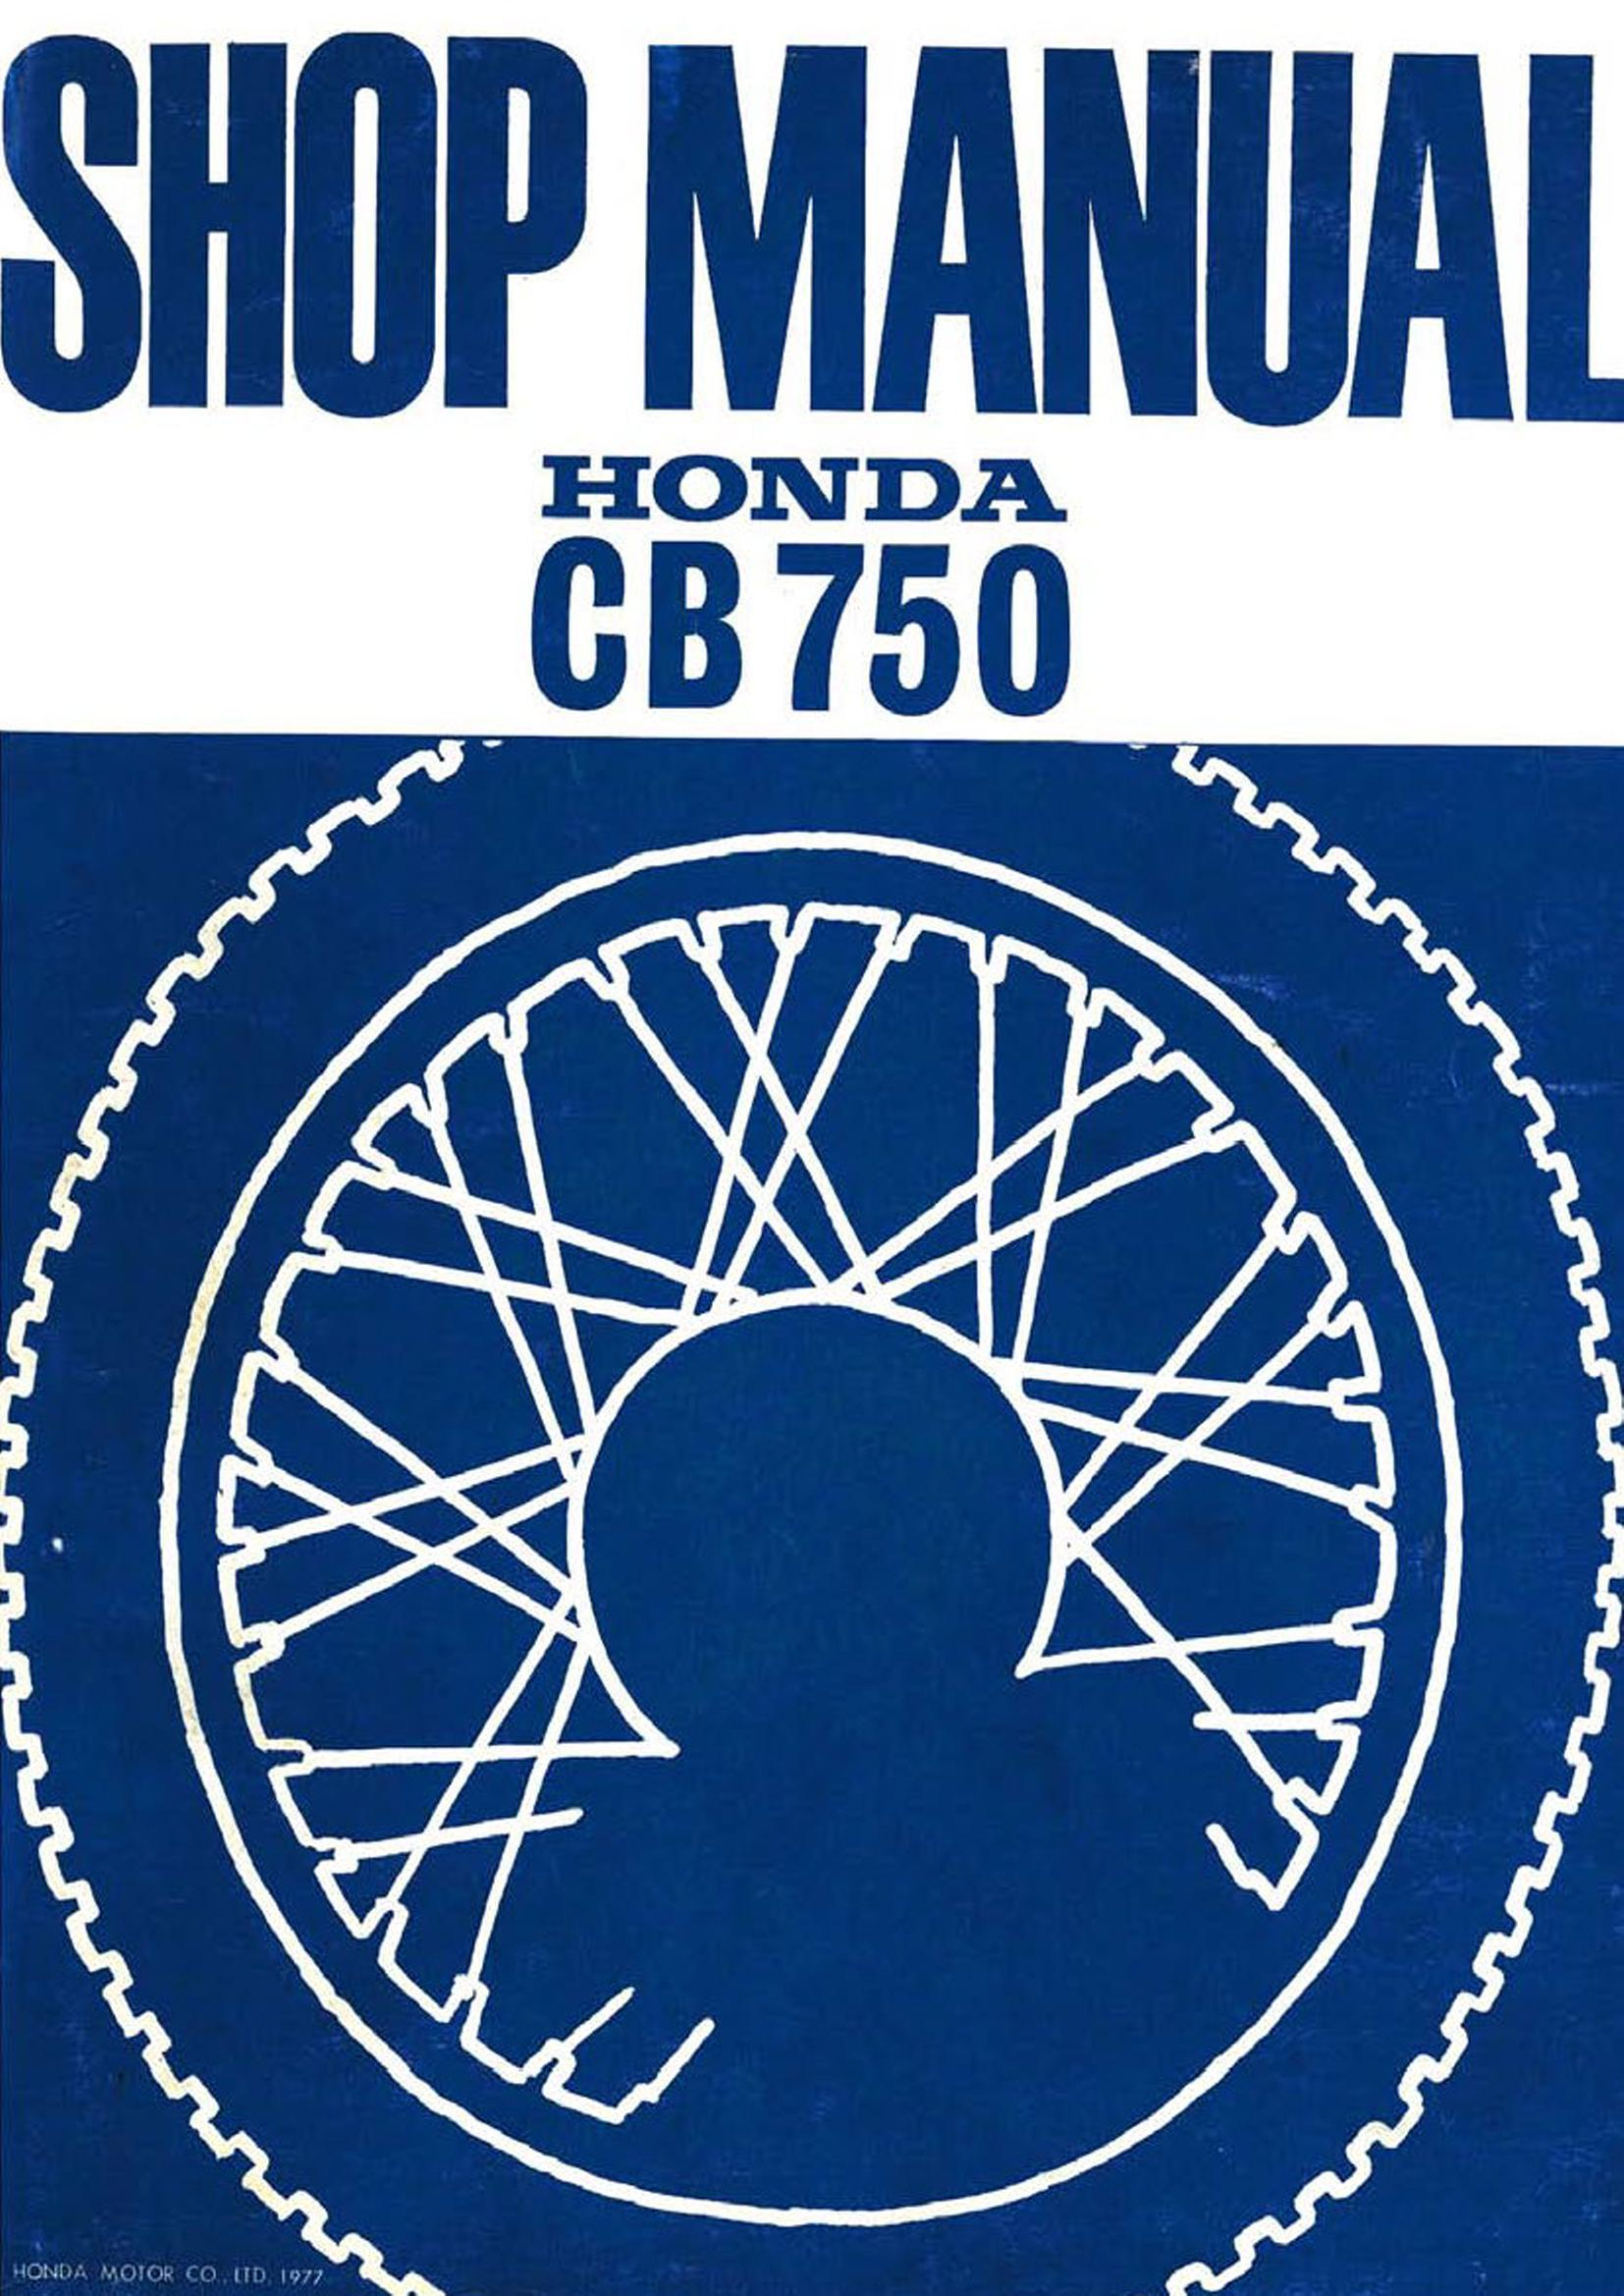 Workshop manual for Honda CB750F (1977)